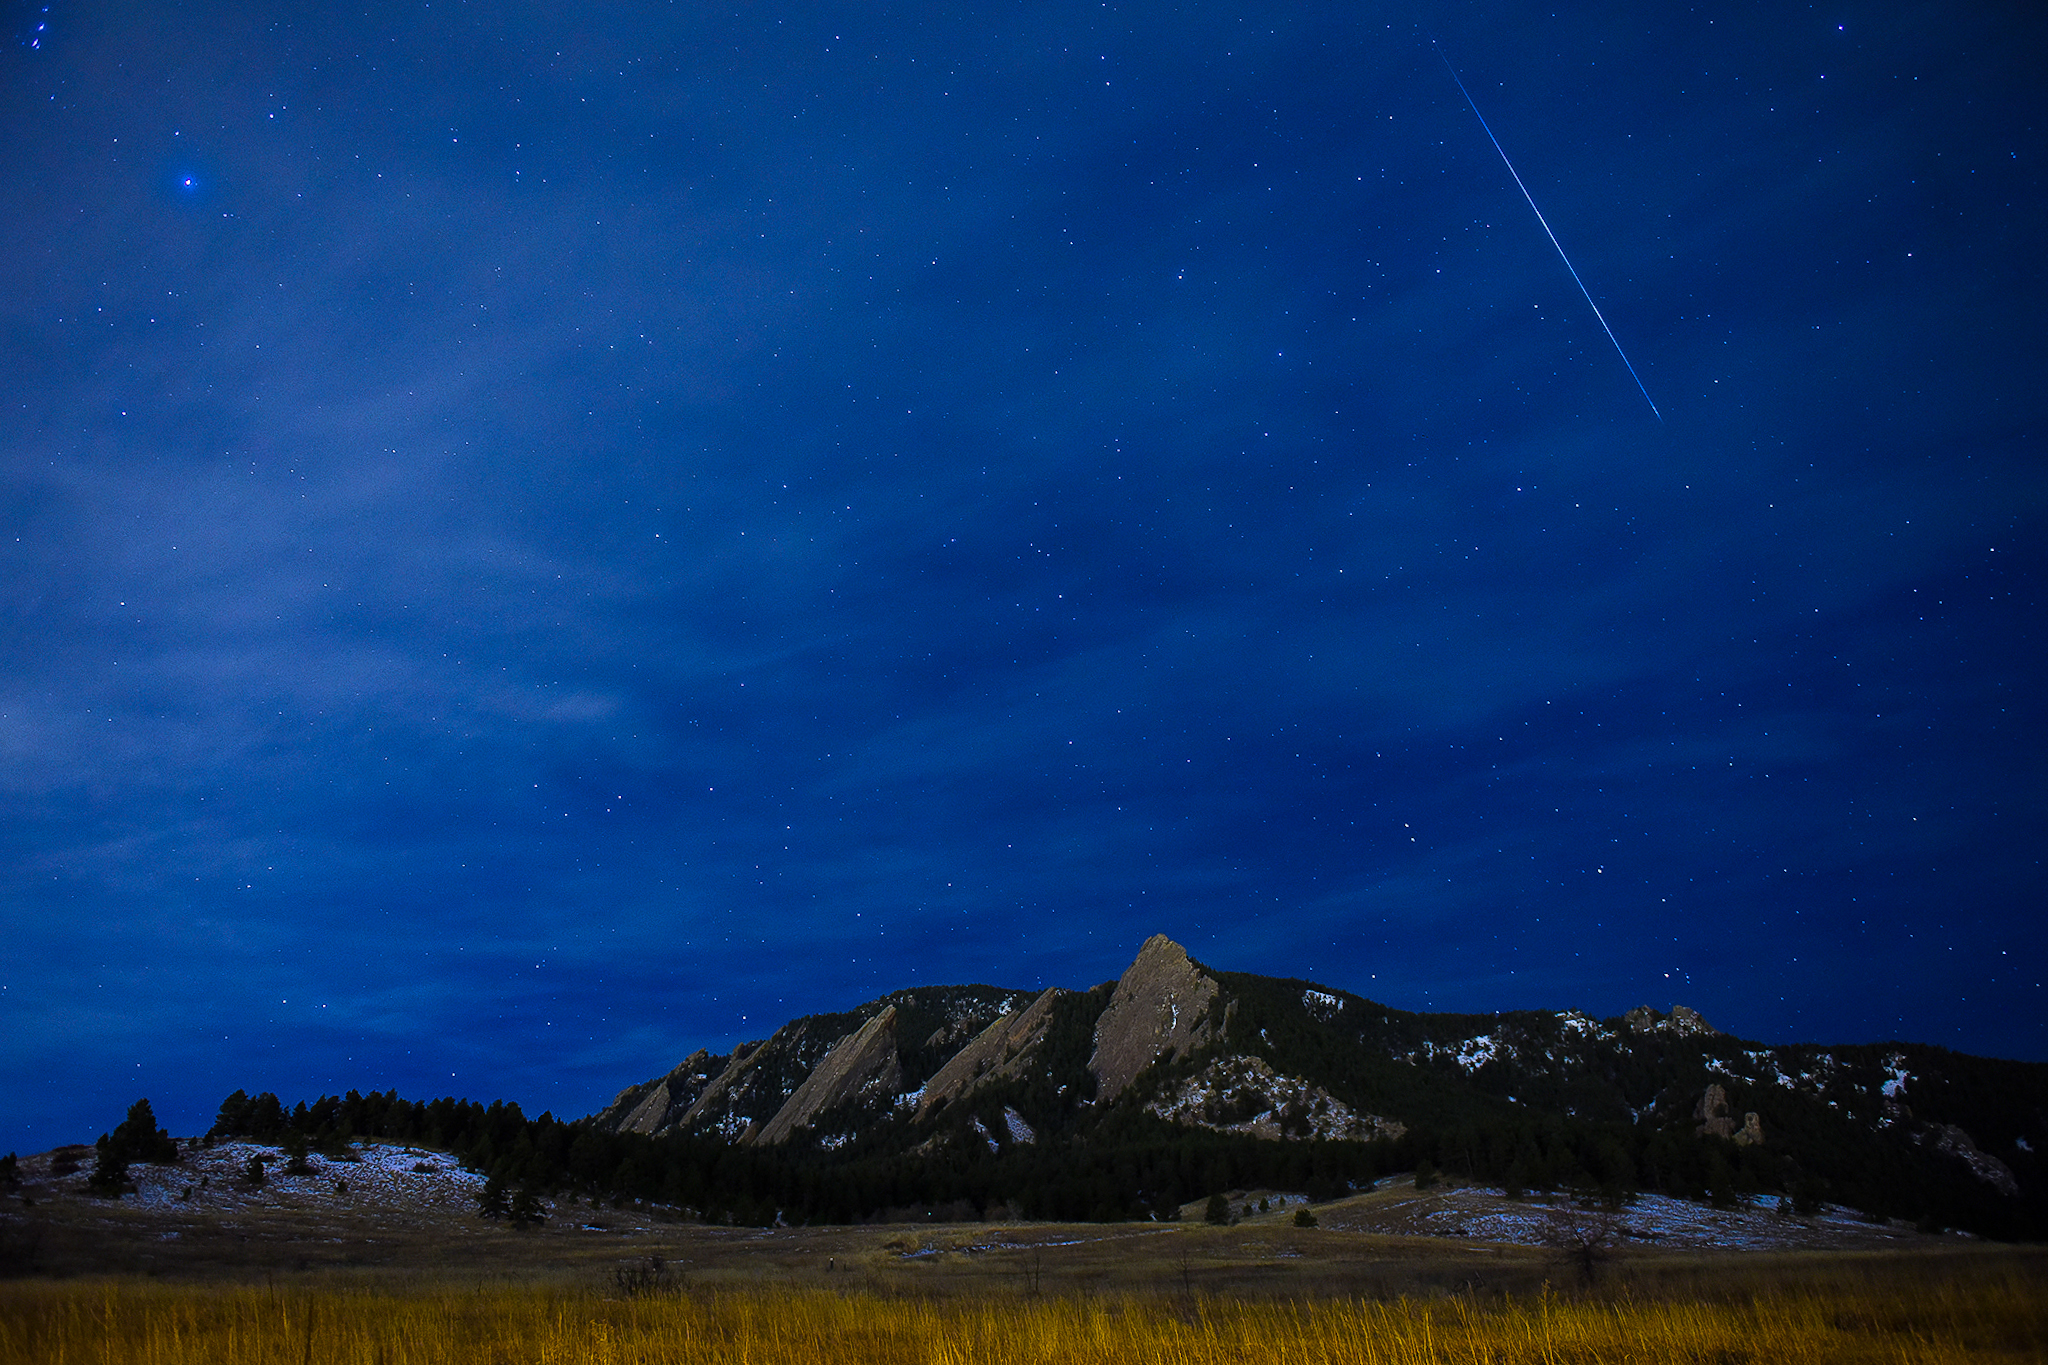 12142018_bruce_geminid meteor shower_0122.jpg